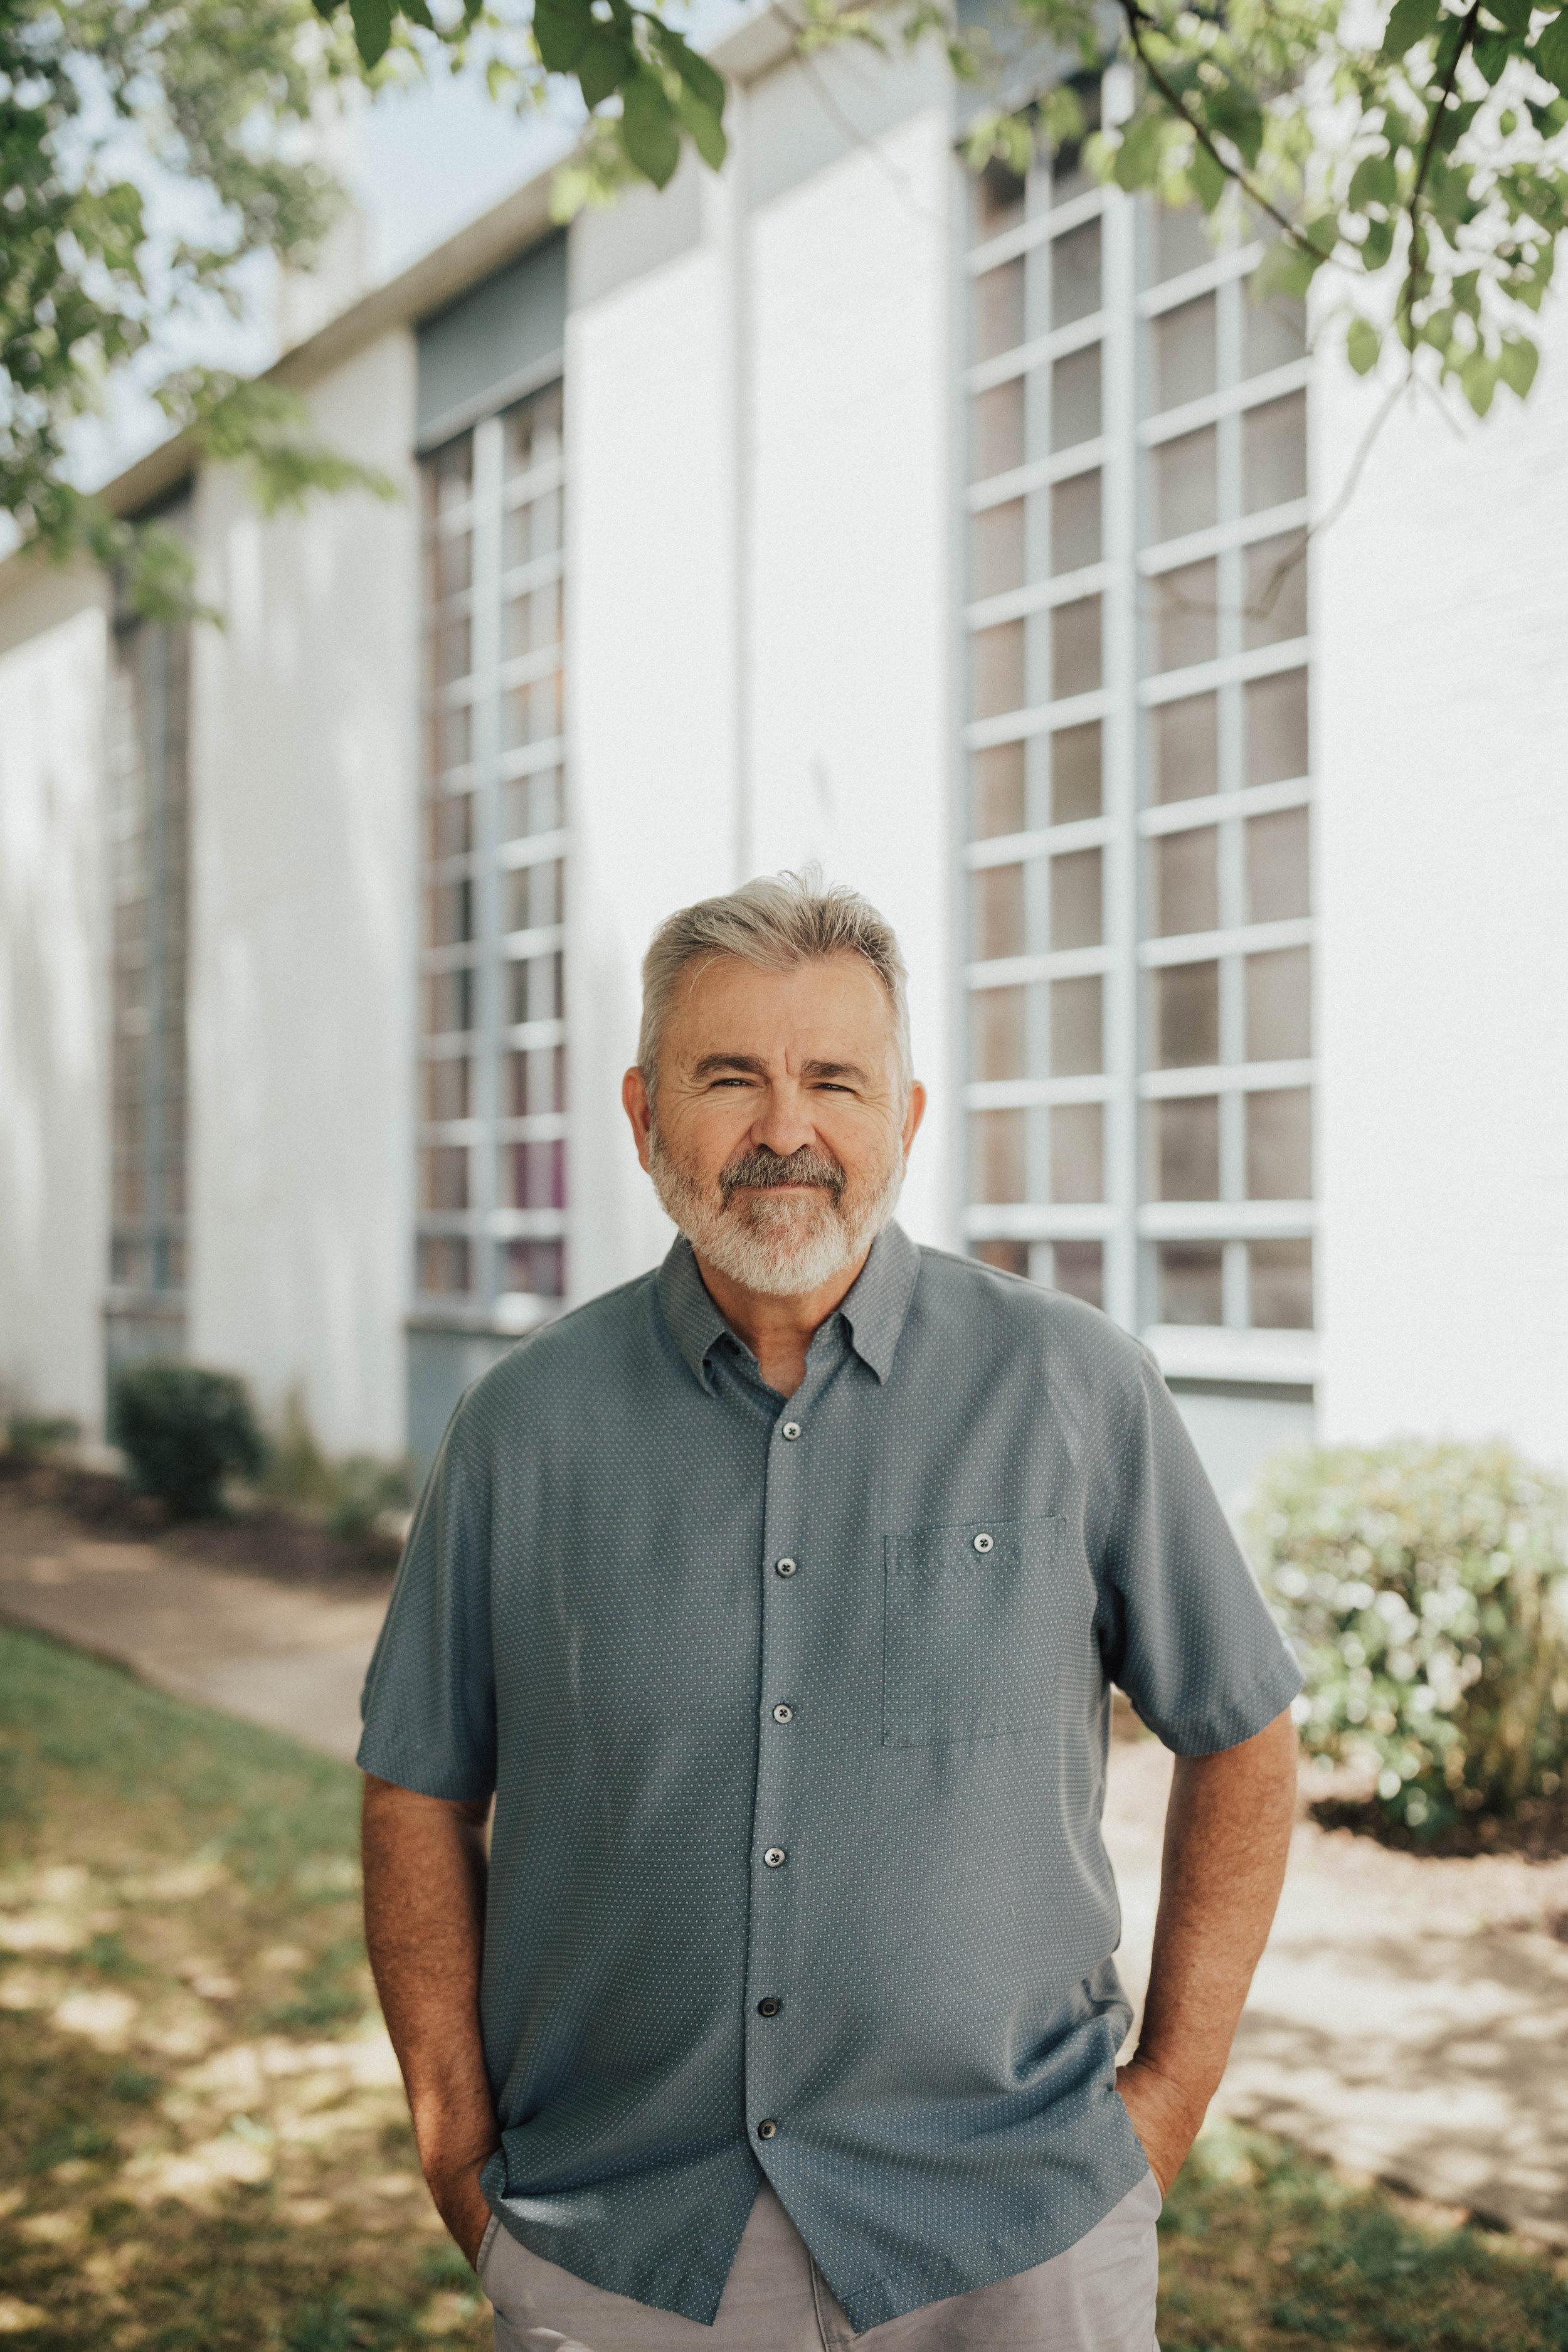 Brad Wyatt     Connections and Shepherding Pastor / Elder   brad@mosaicmemphis.com